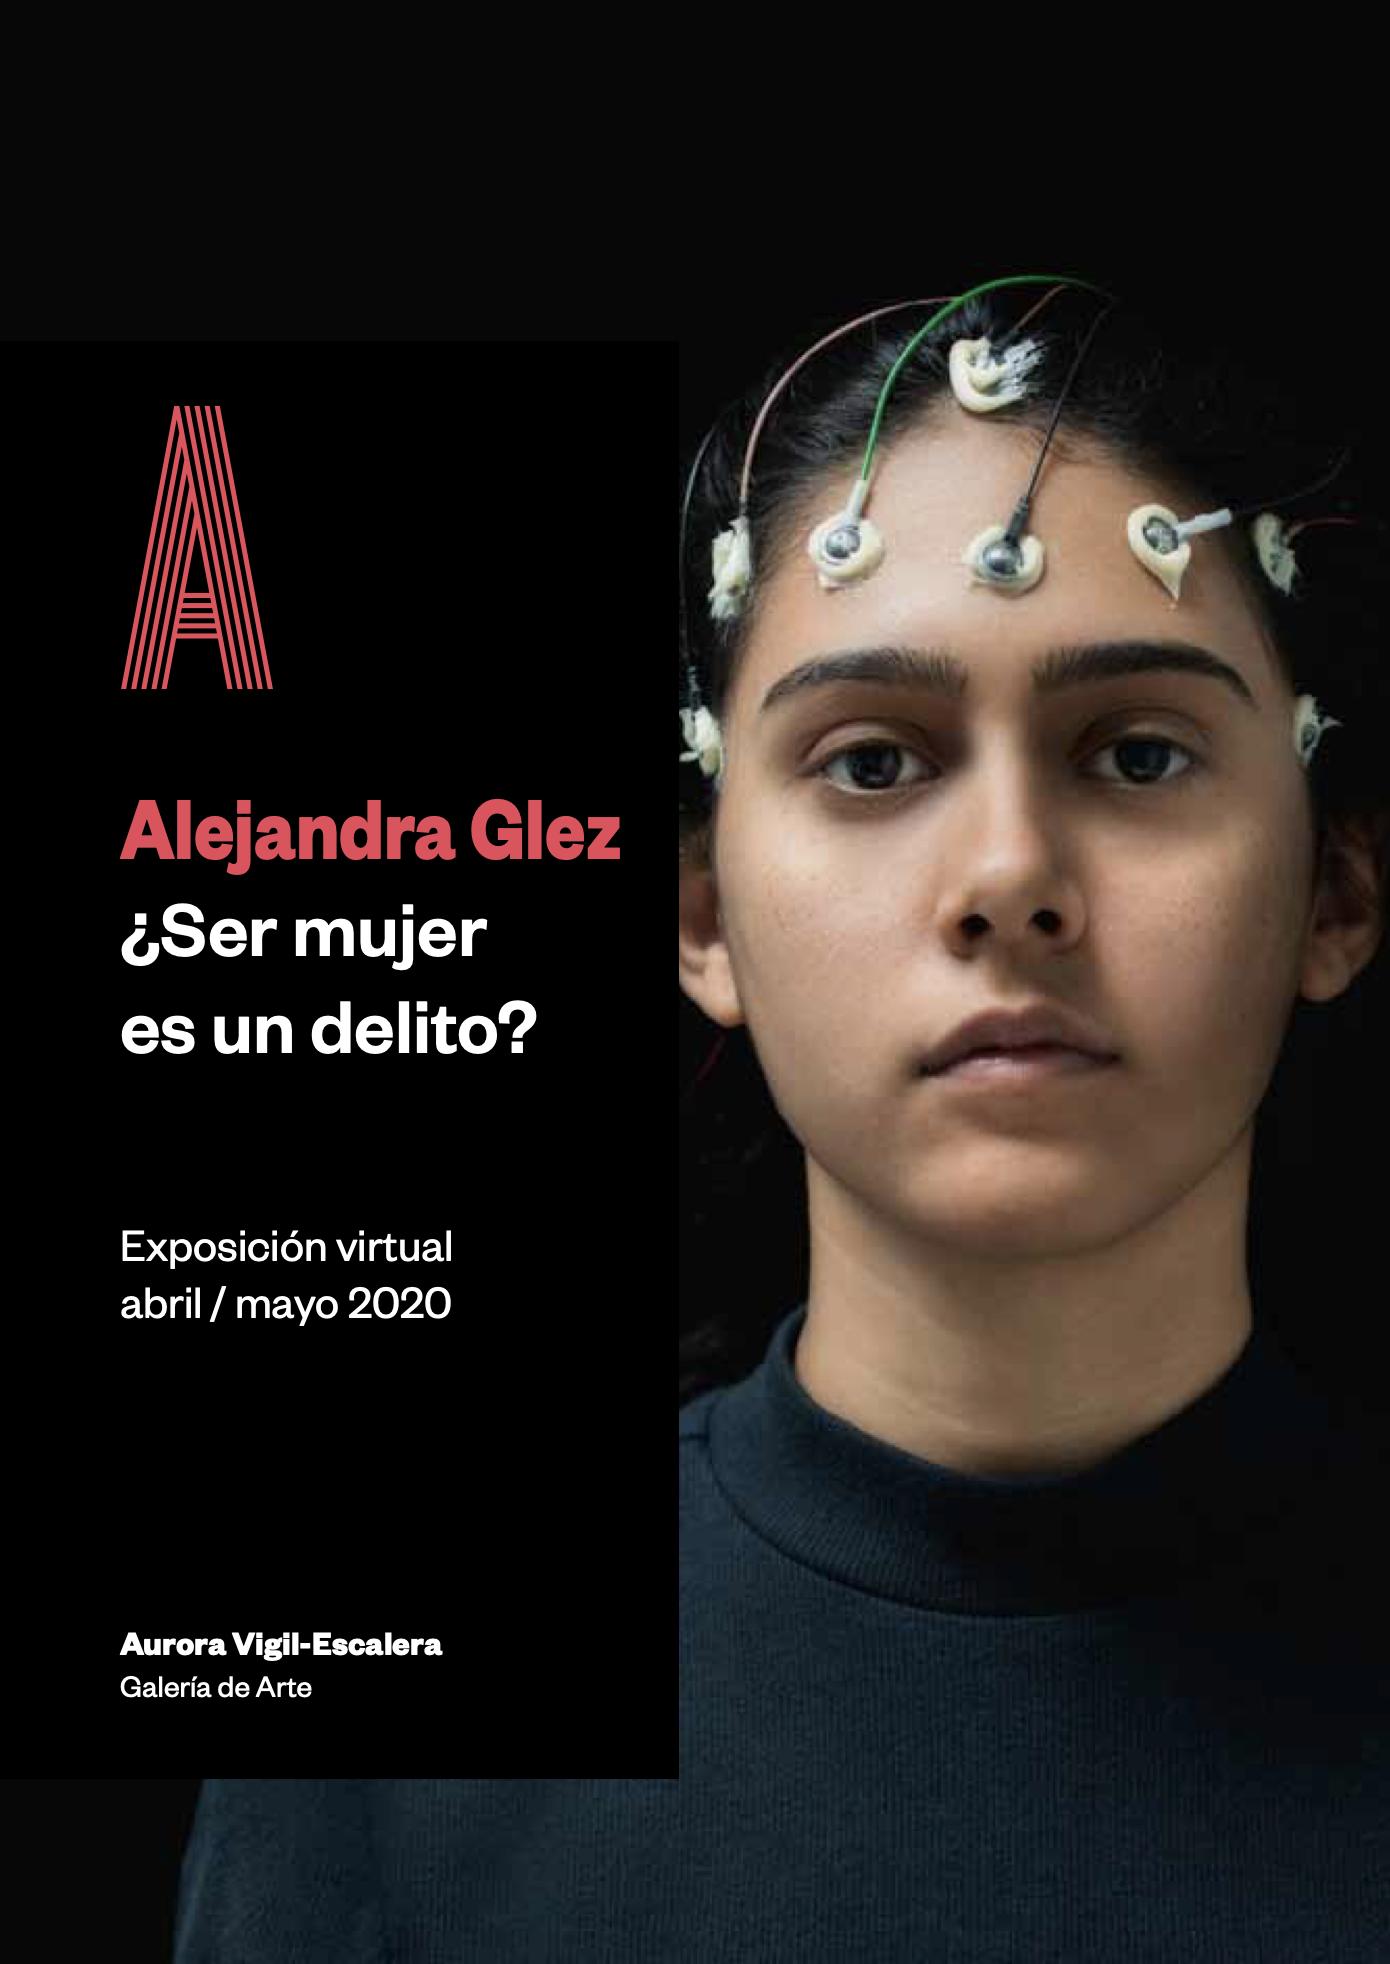 Alejandra Glez